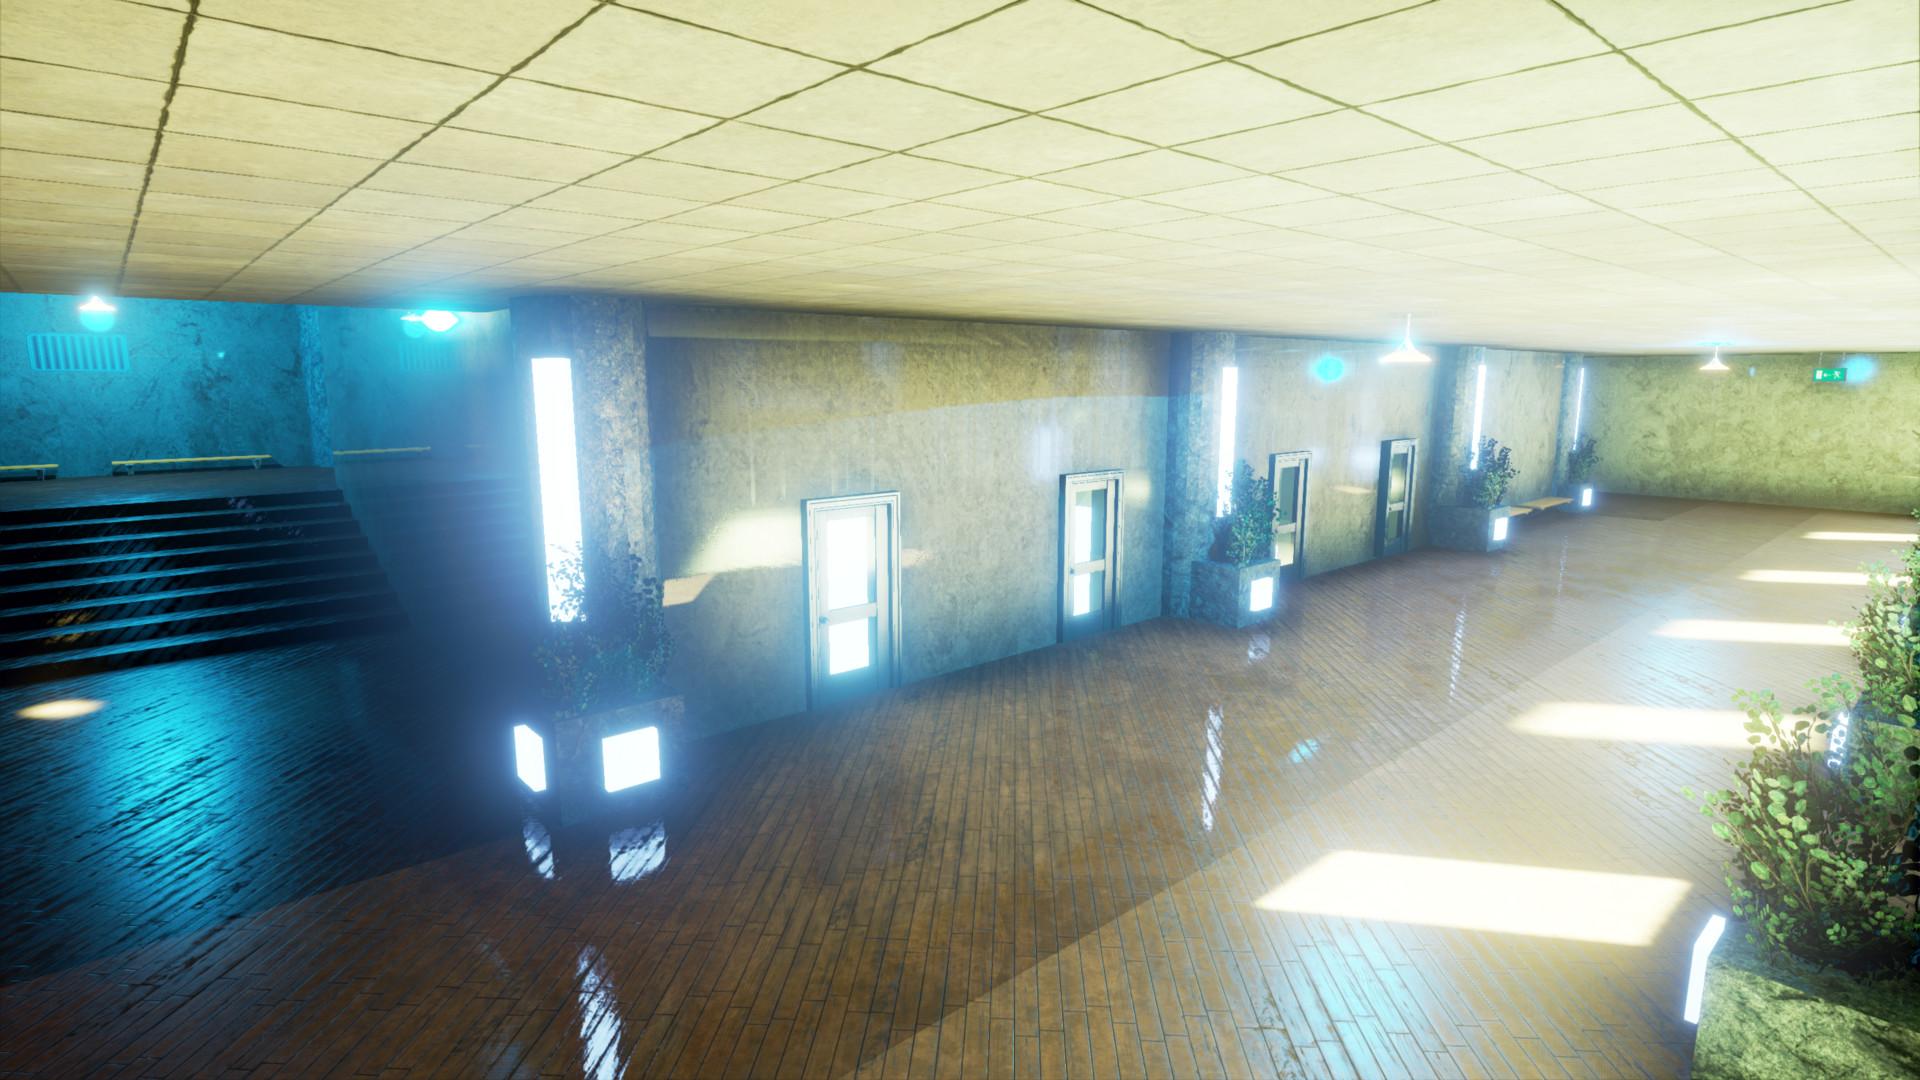 Corridor Project - Day